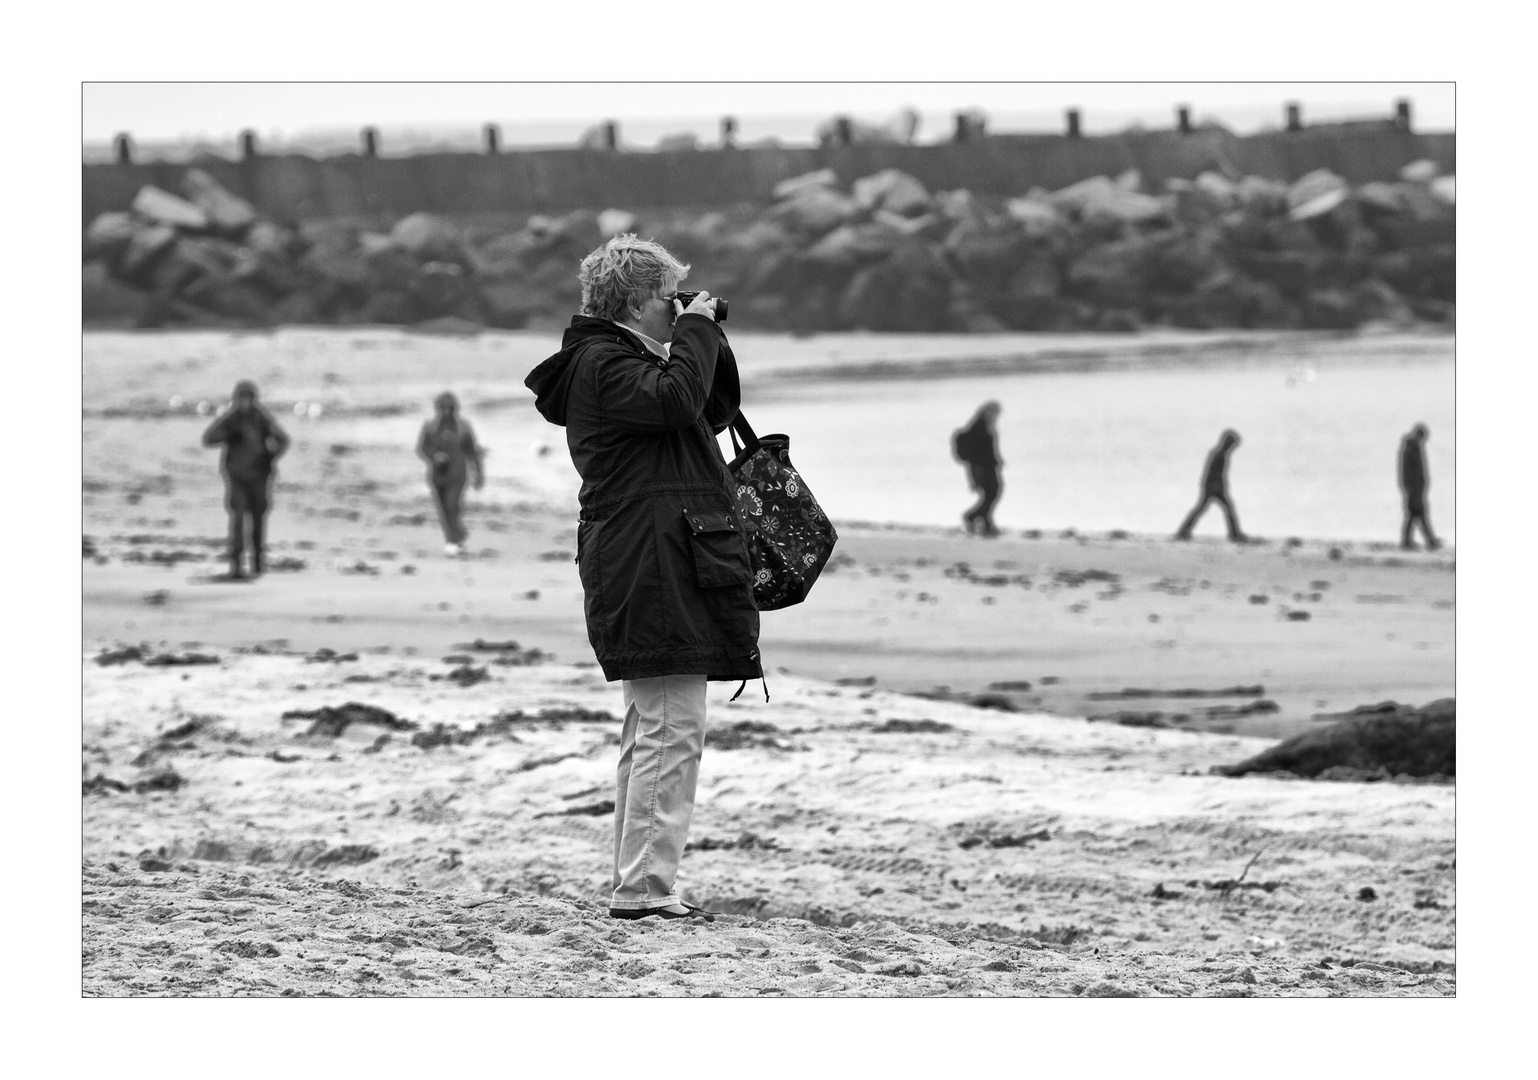 Fotografieren am Strand